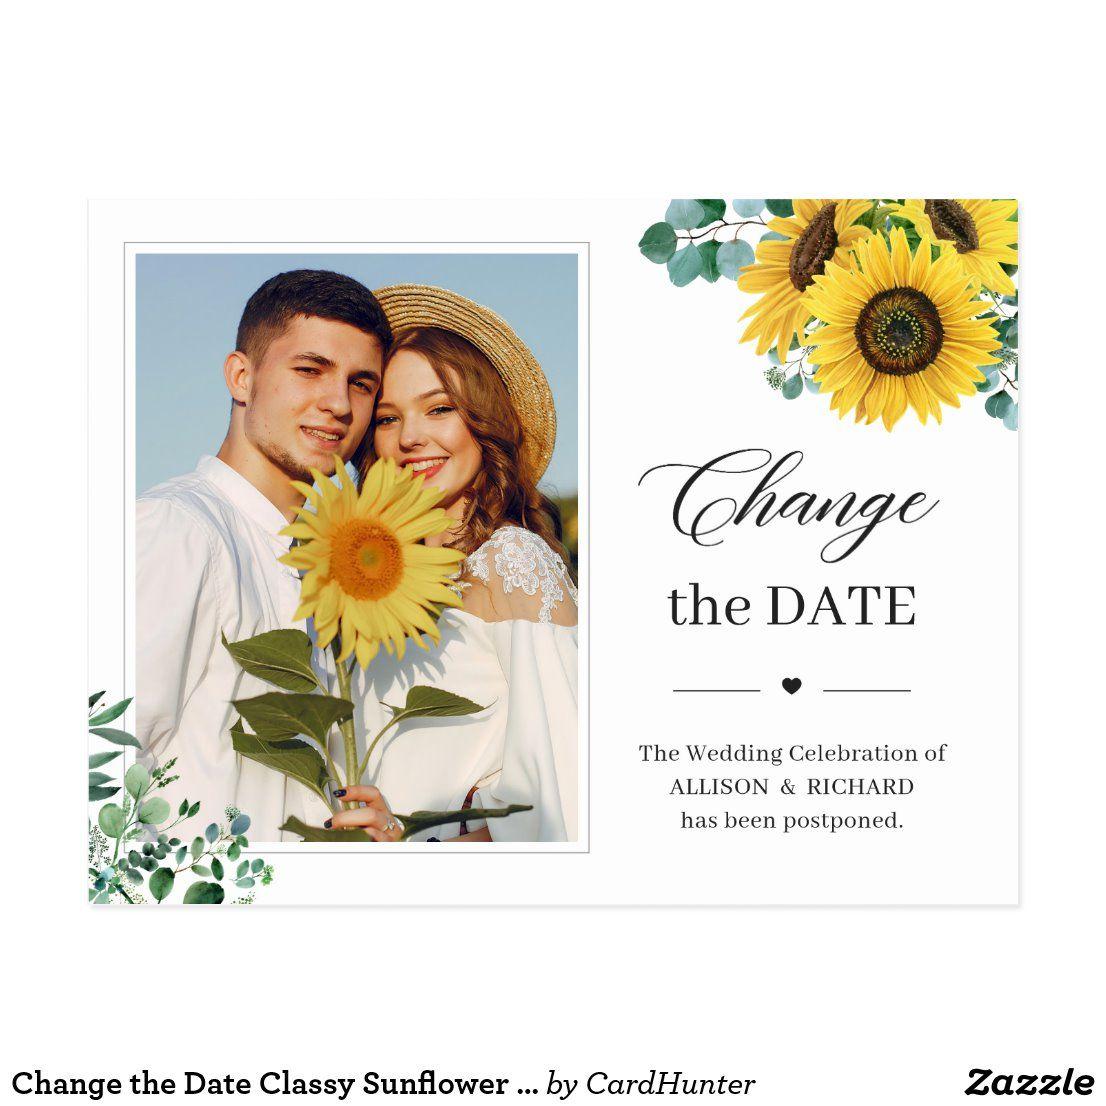 Change the date classy sunflower eucalyptus photo postcard